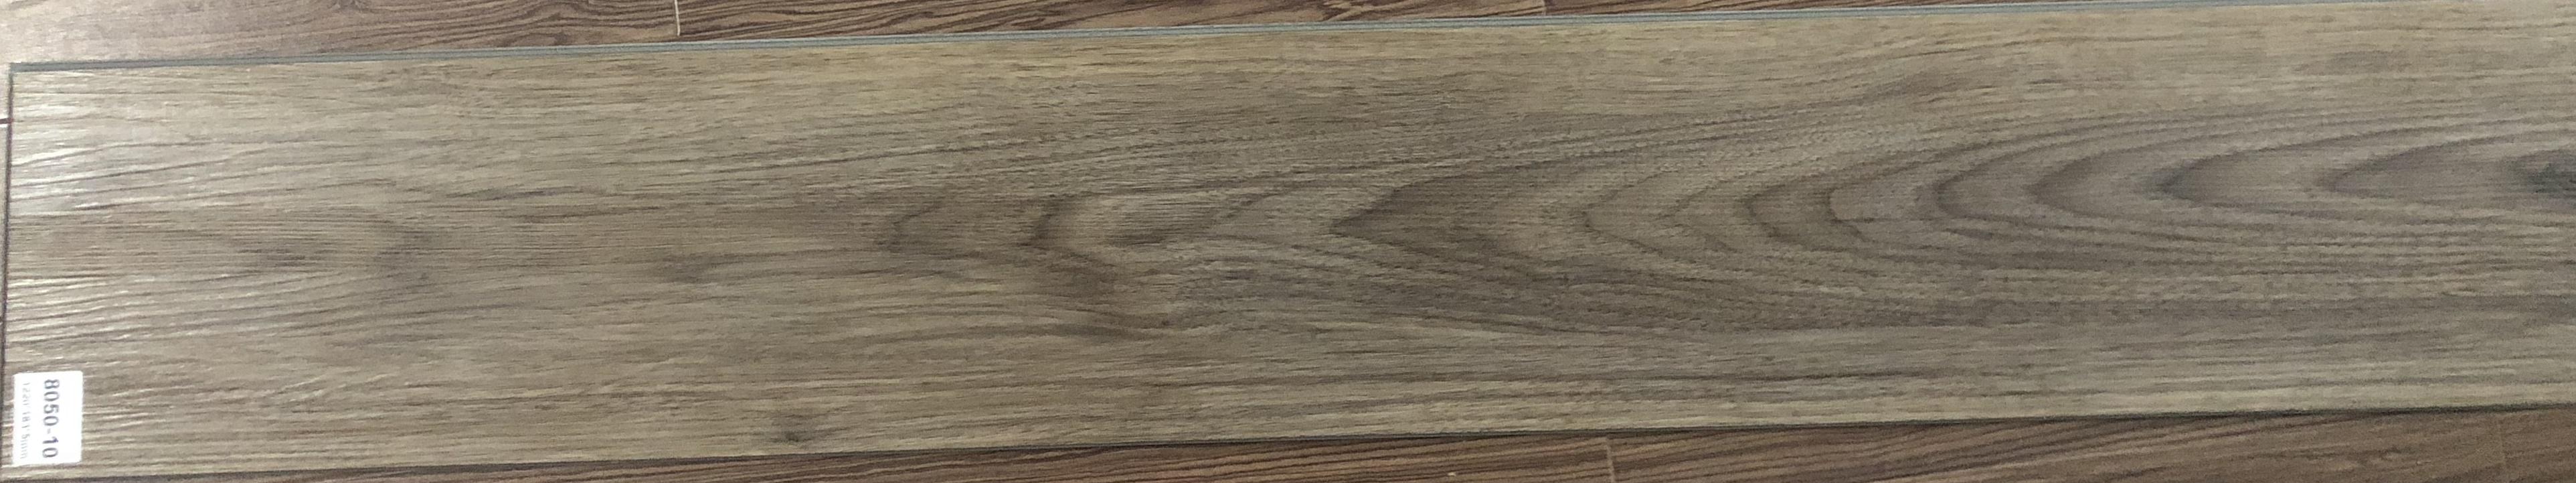 vinyl click engineered flooring for interior floor